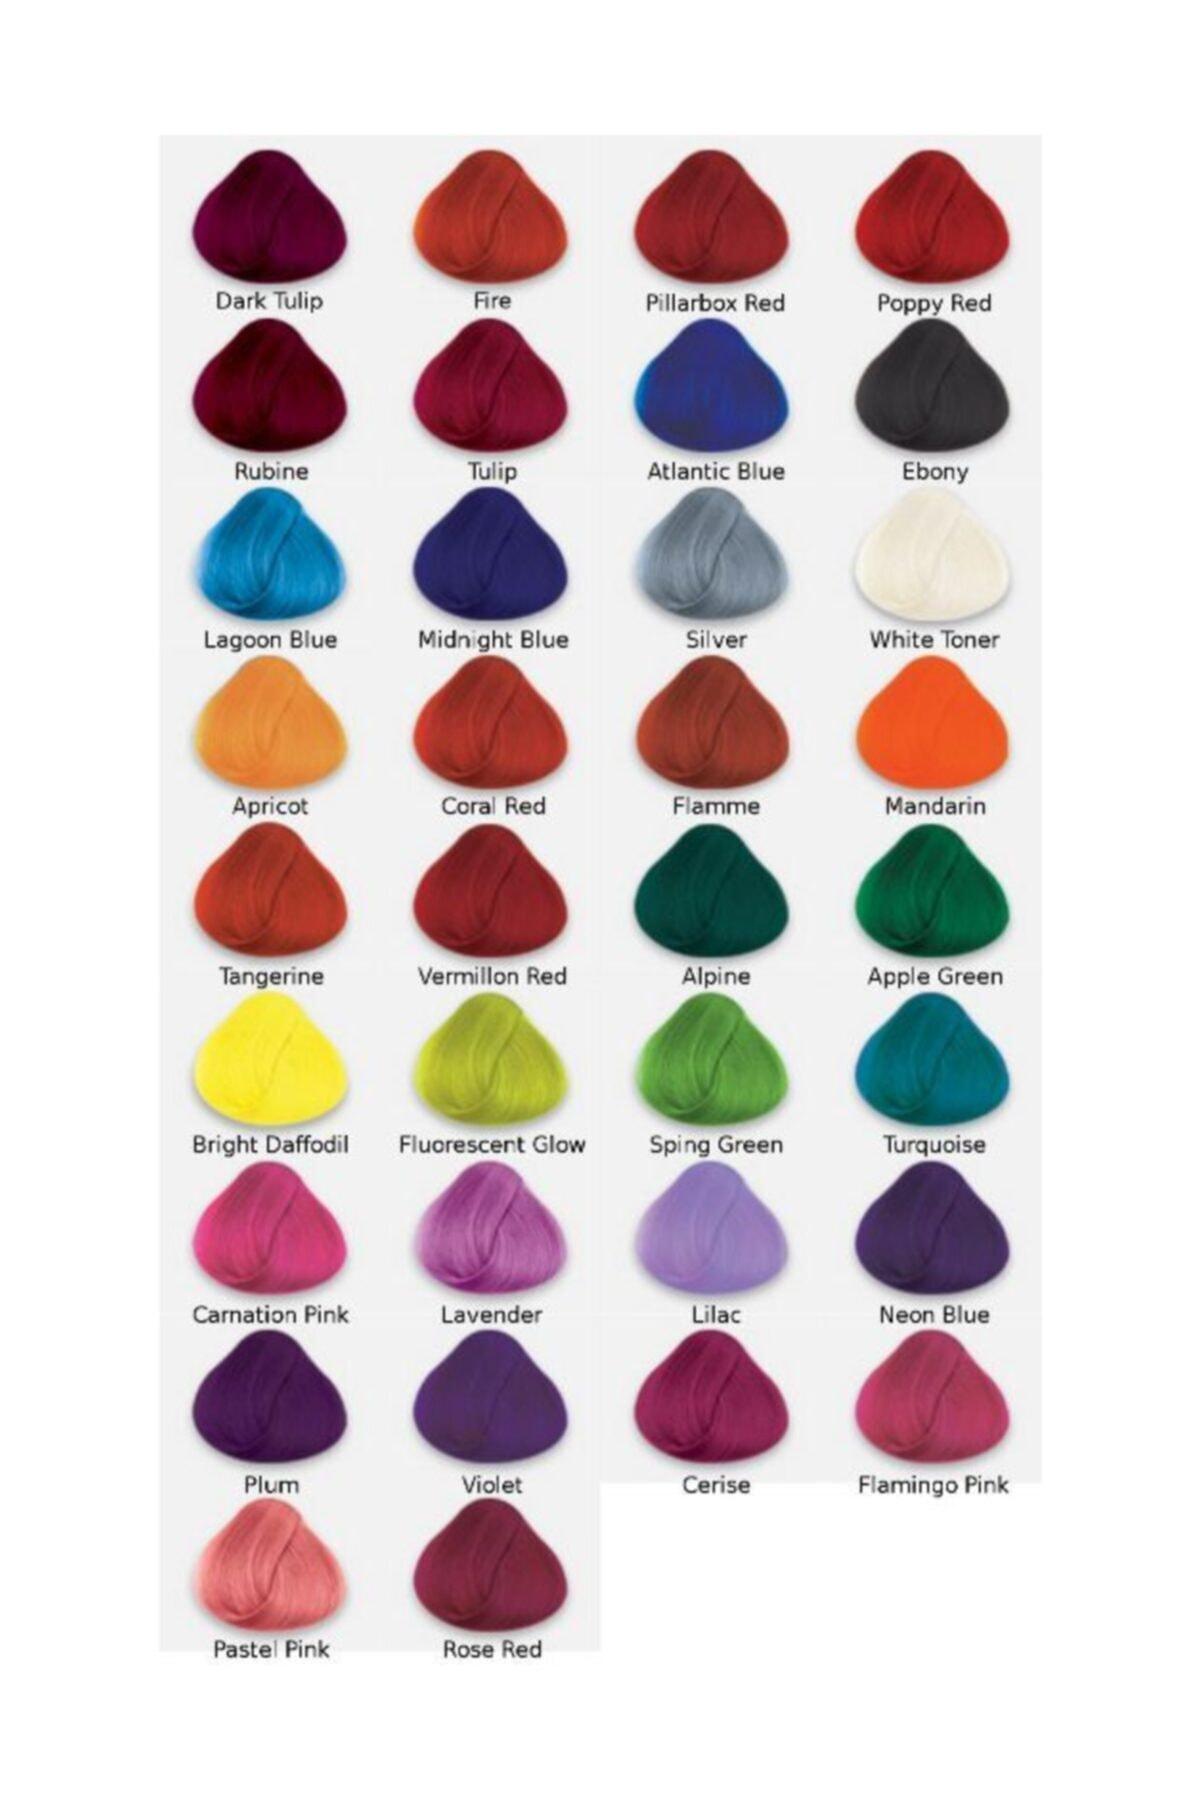 Köstebek La Riche Directions - Neon Blue Saç Boyası 88ml 2